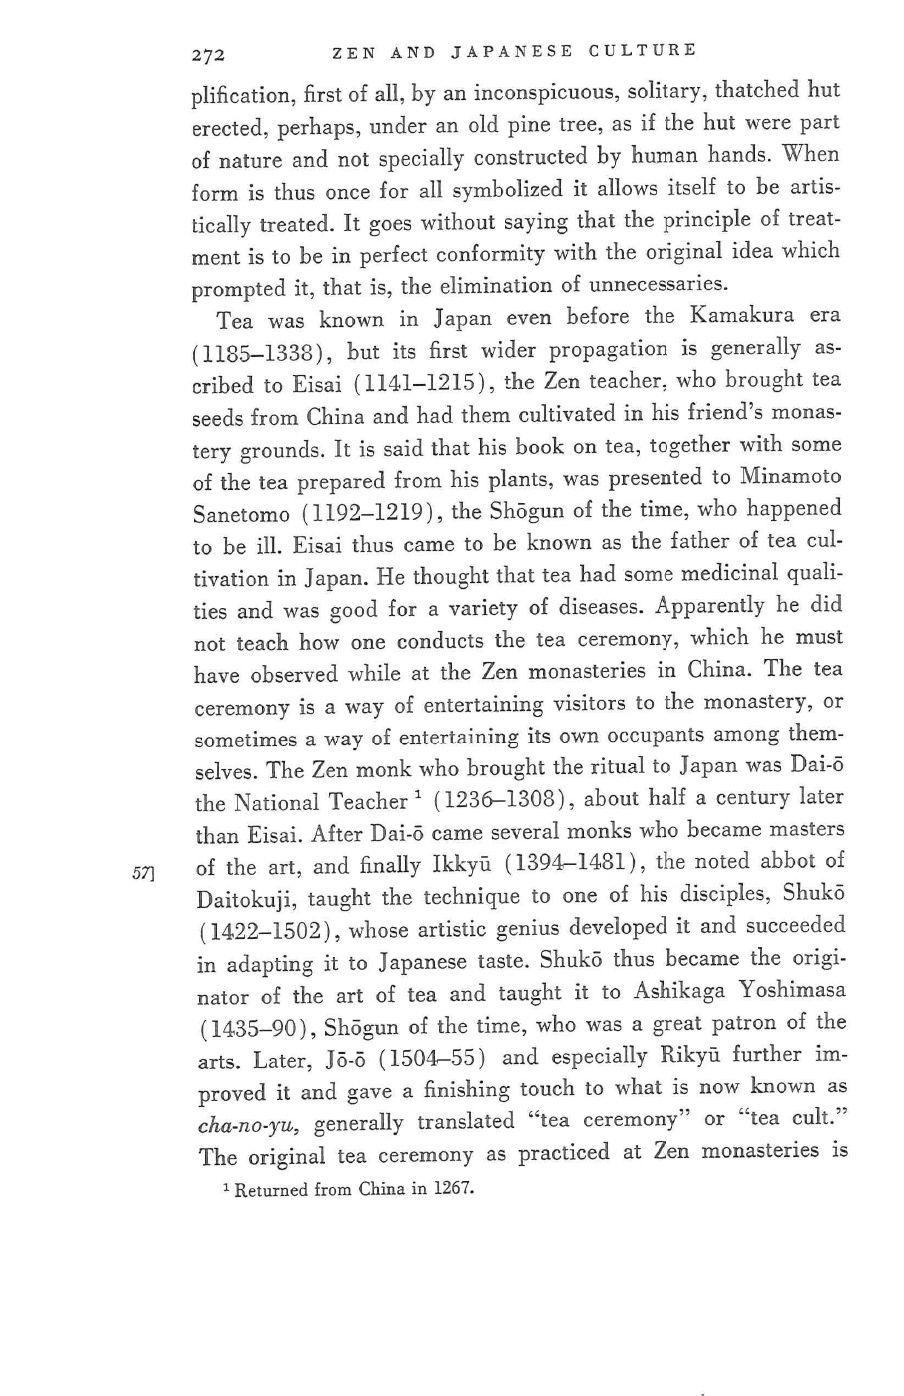 D.T.Suzuki - Zen and Japanese Culture.pdf | Zen and Japanese Culture